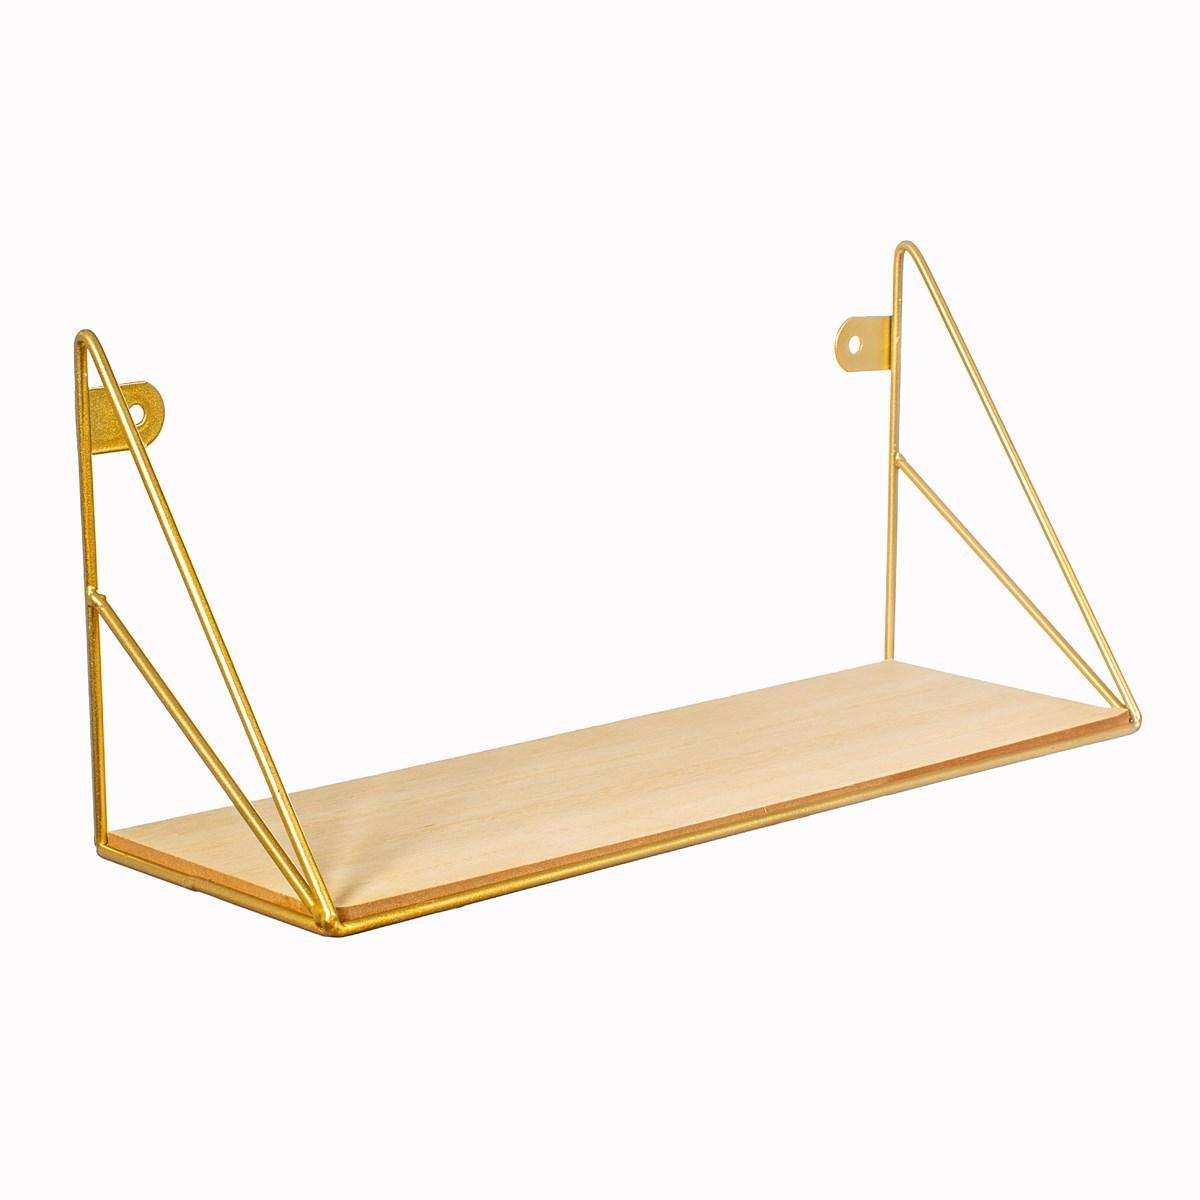 Polička Loft zlatá 35 cm_2